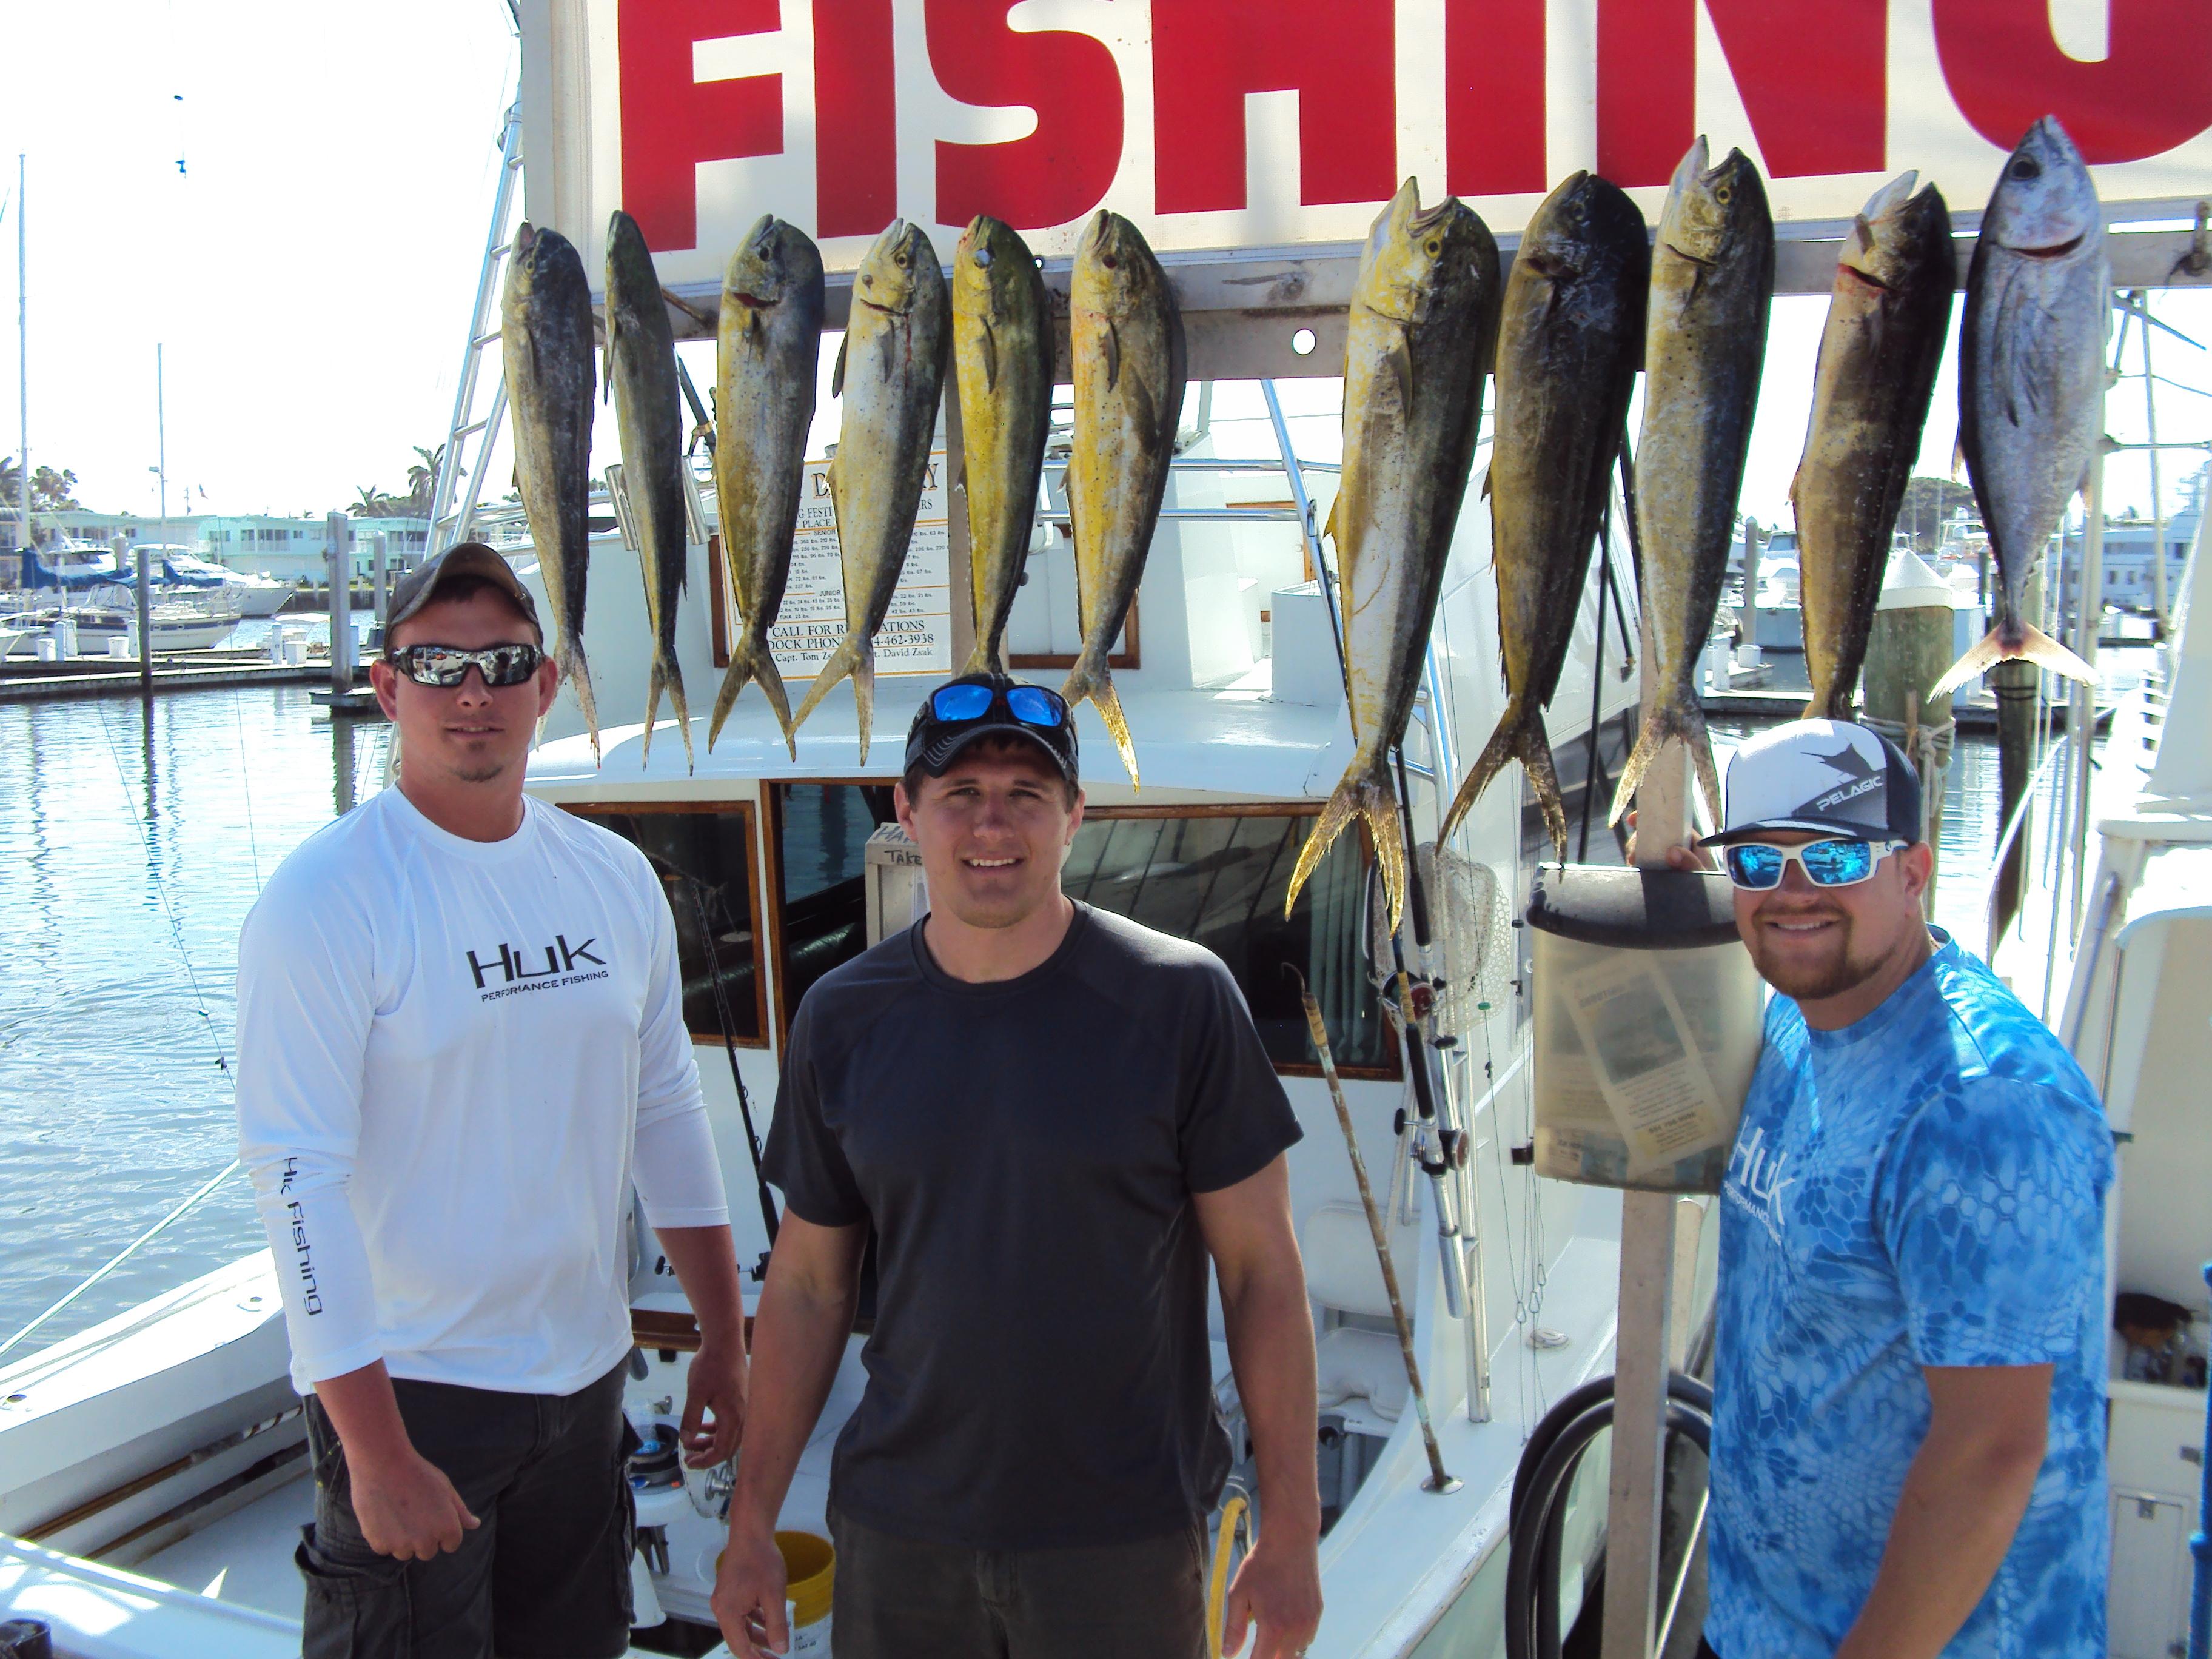 Fort lauderdale charter fishing top shot sportfishing for Fishing in fort lauderdale